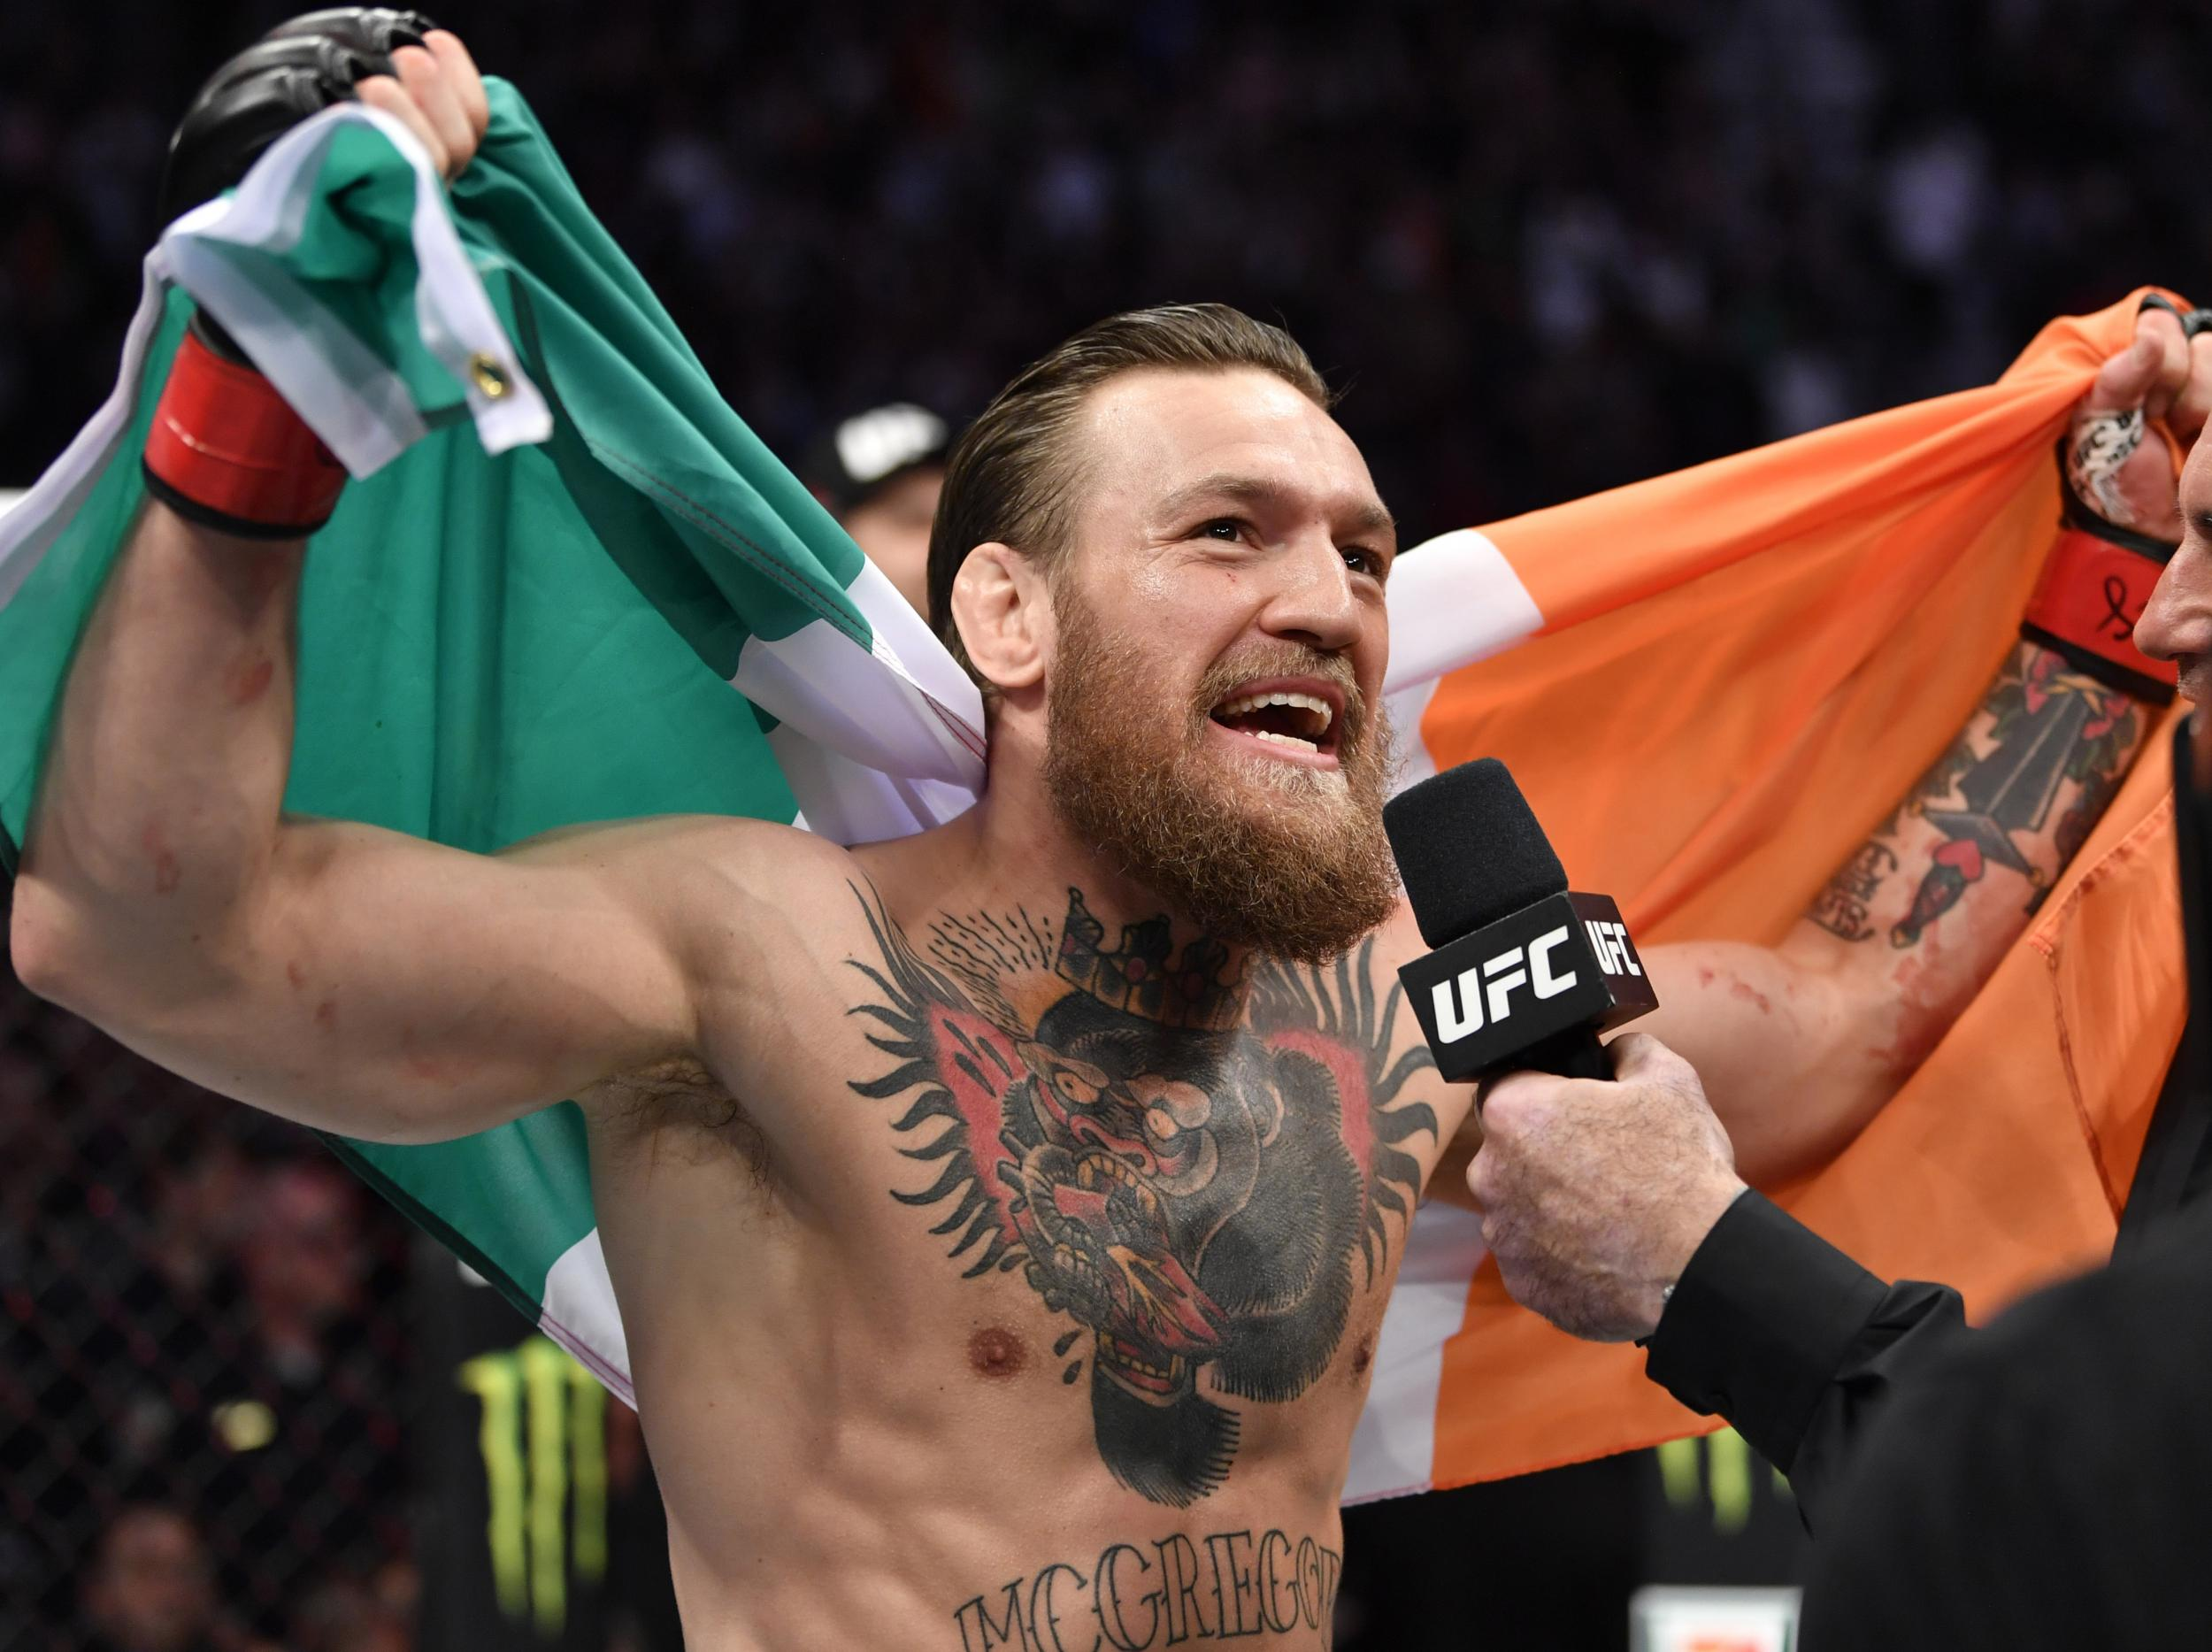 Conor McGregor vs Cowboy, post-fight press conference LIVE: Watch McGregor speak after 40 second knockout win